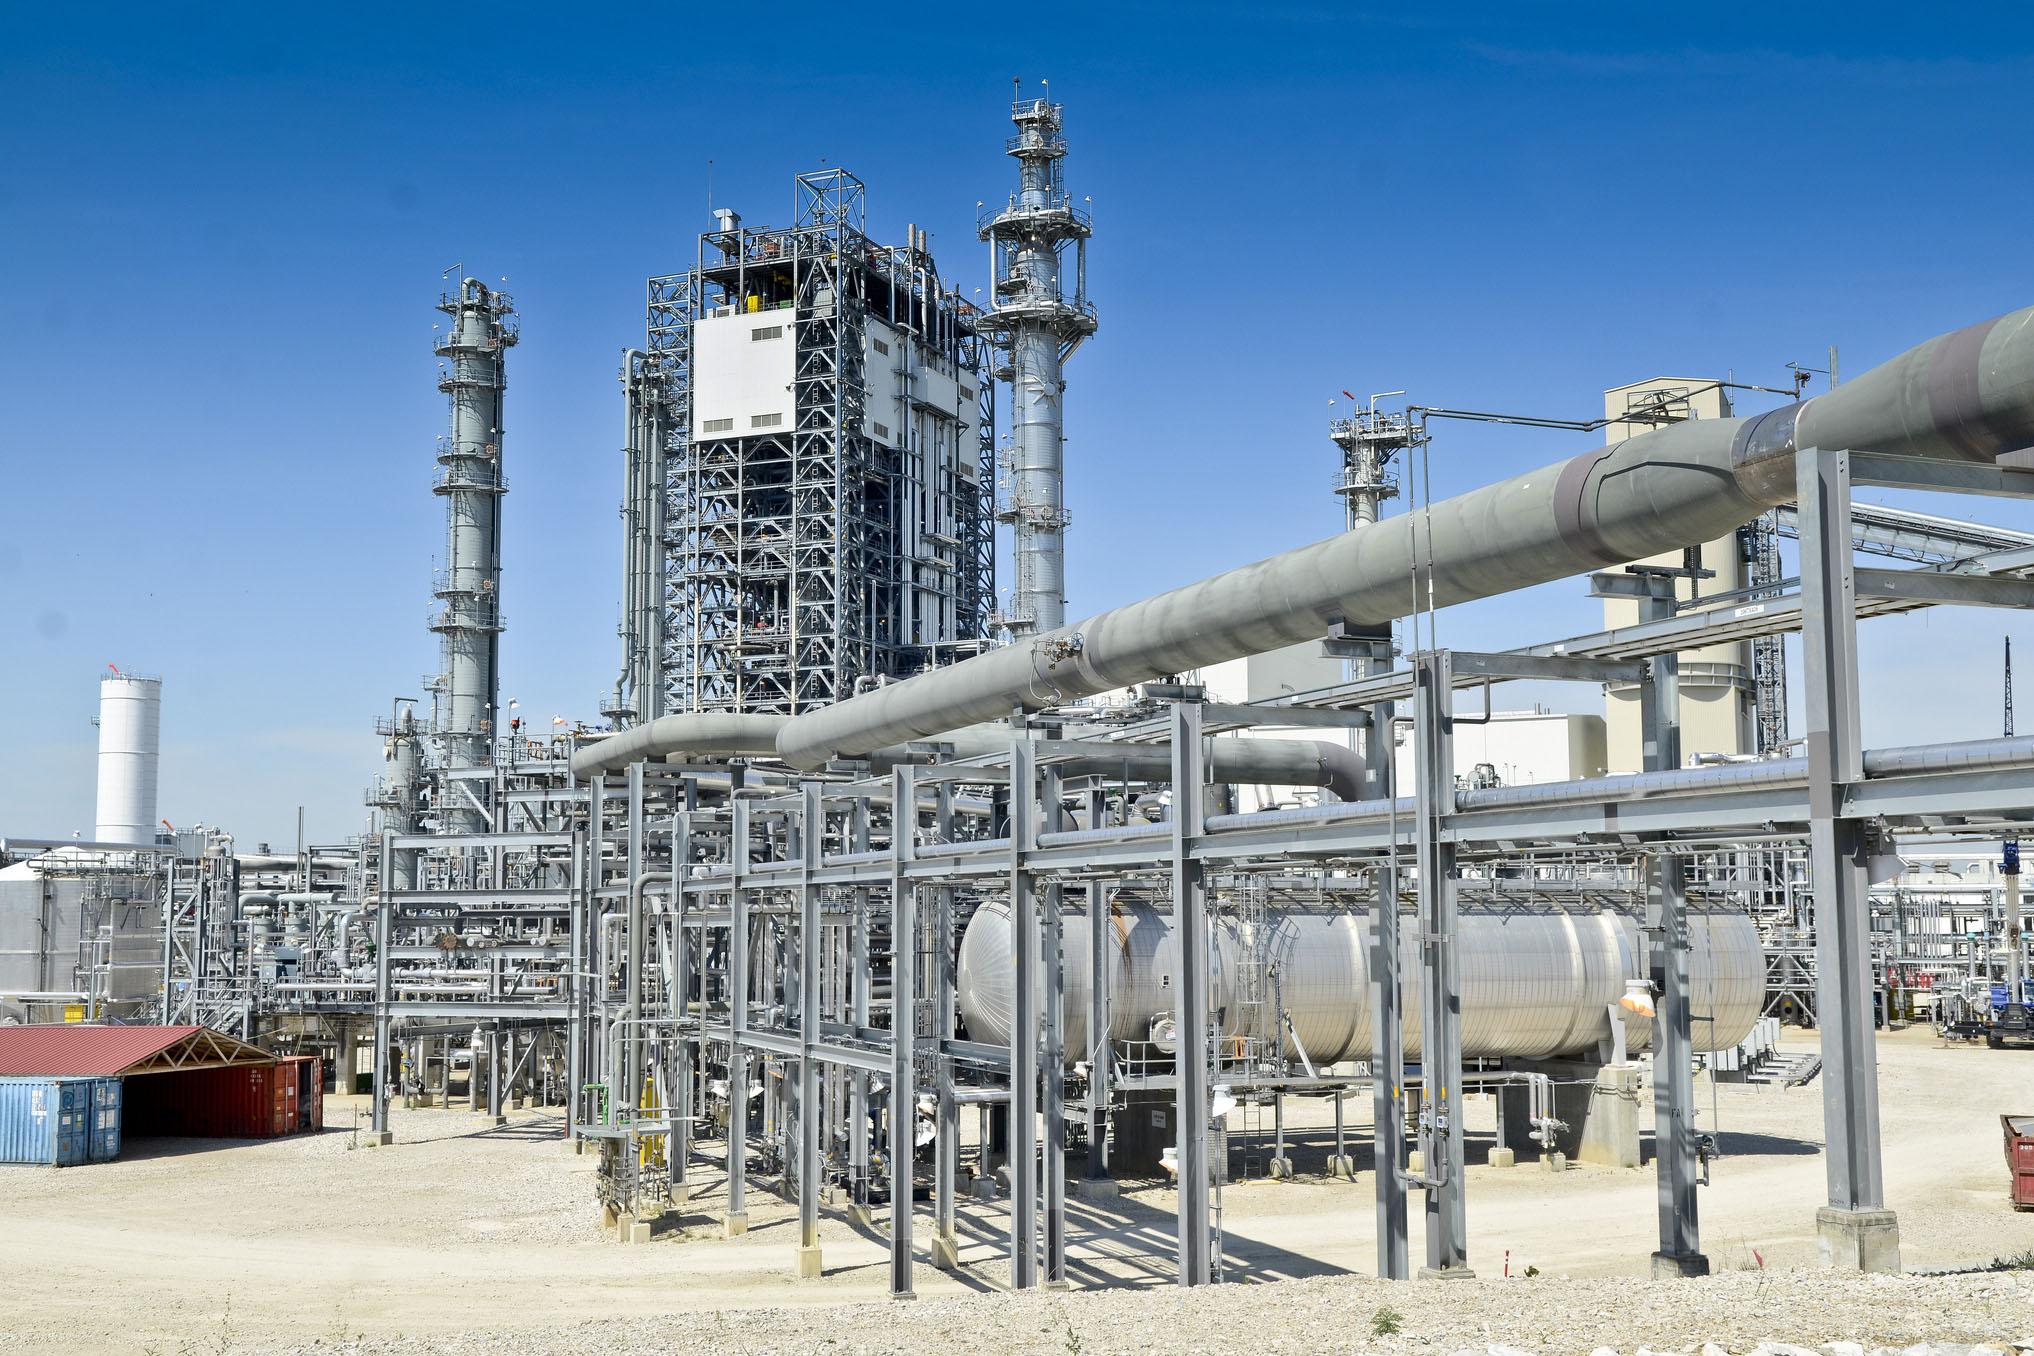 the Duke Energy coal gasification plant in Edwardsport